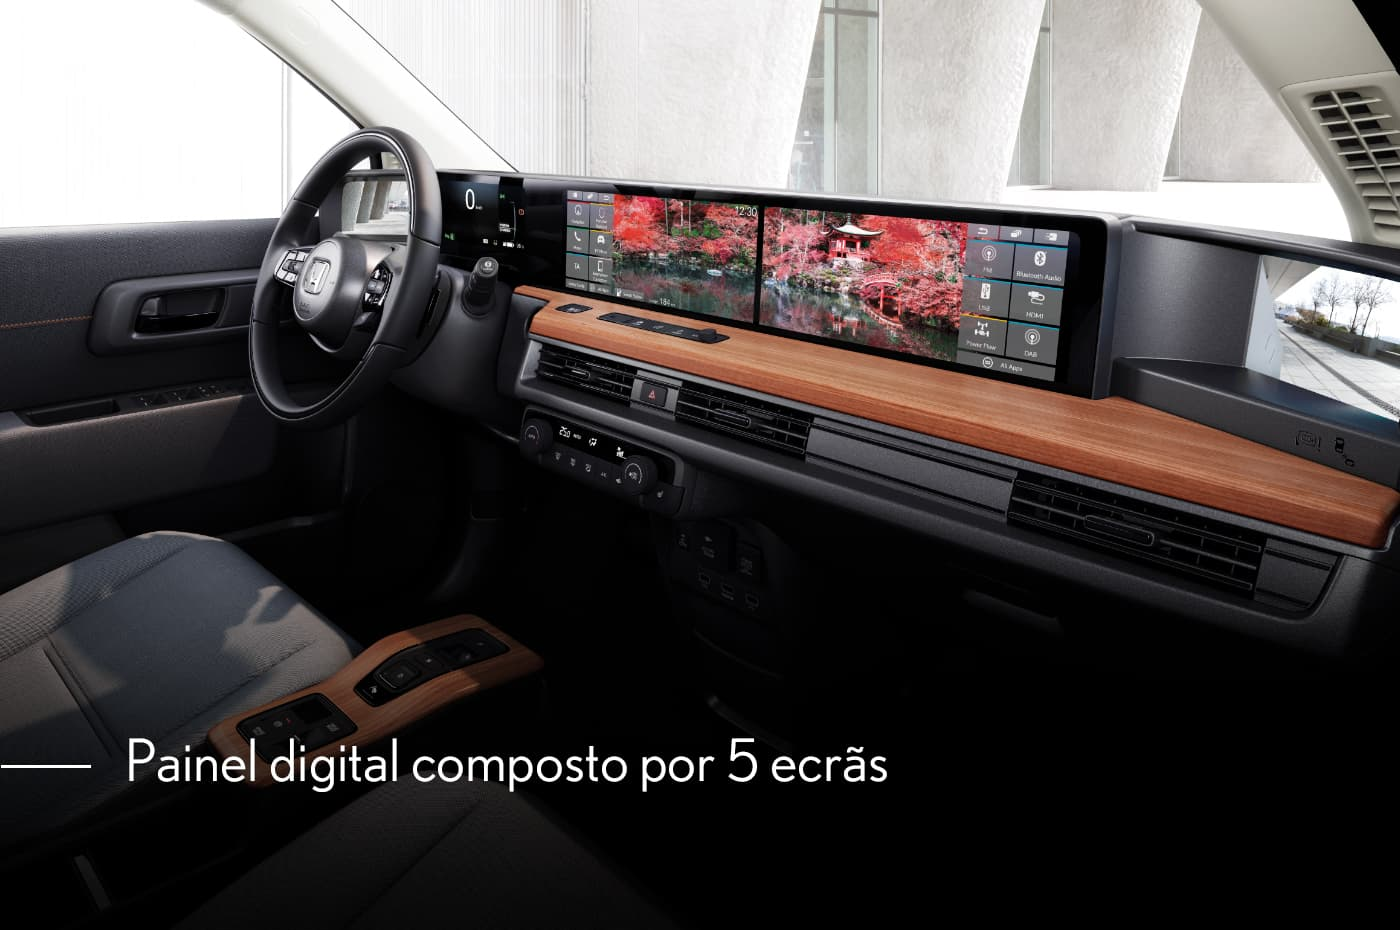 painel-digital